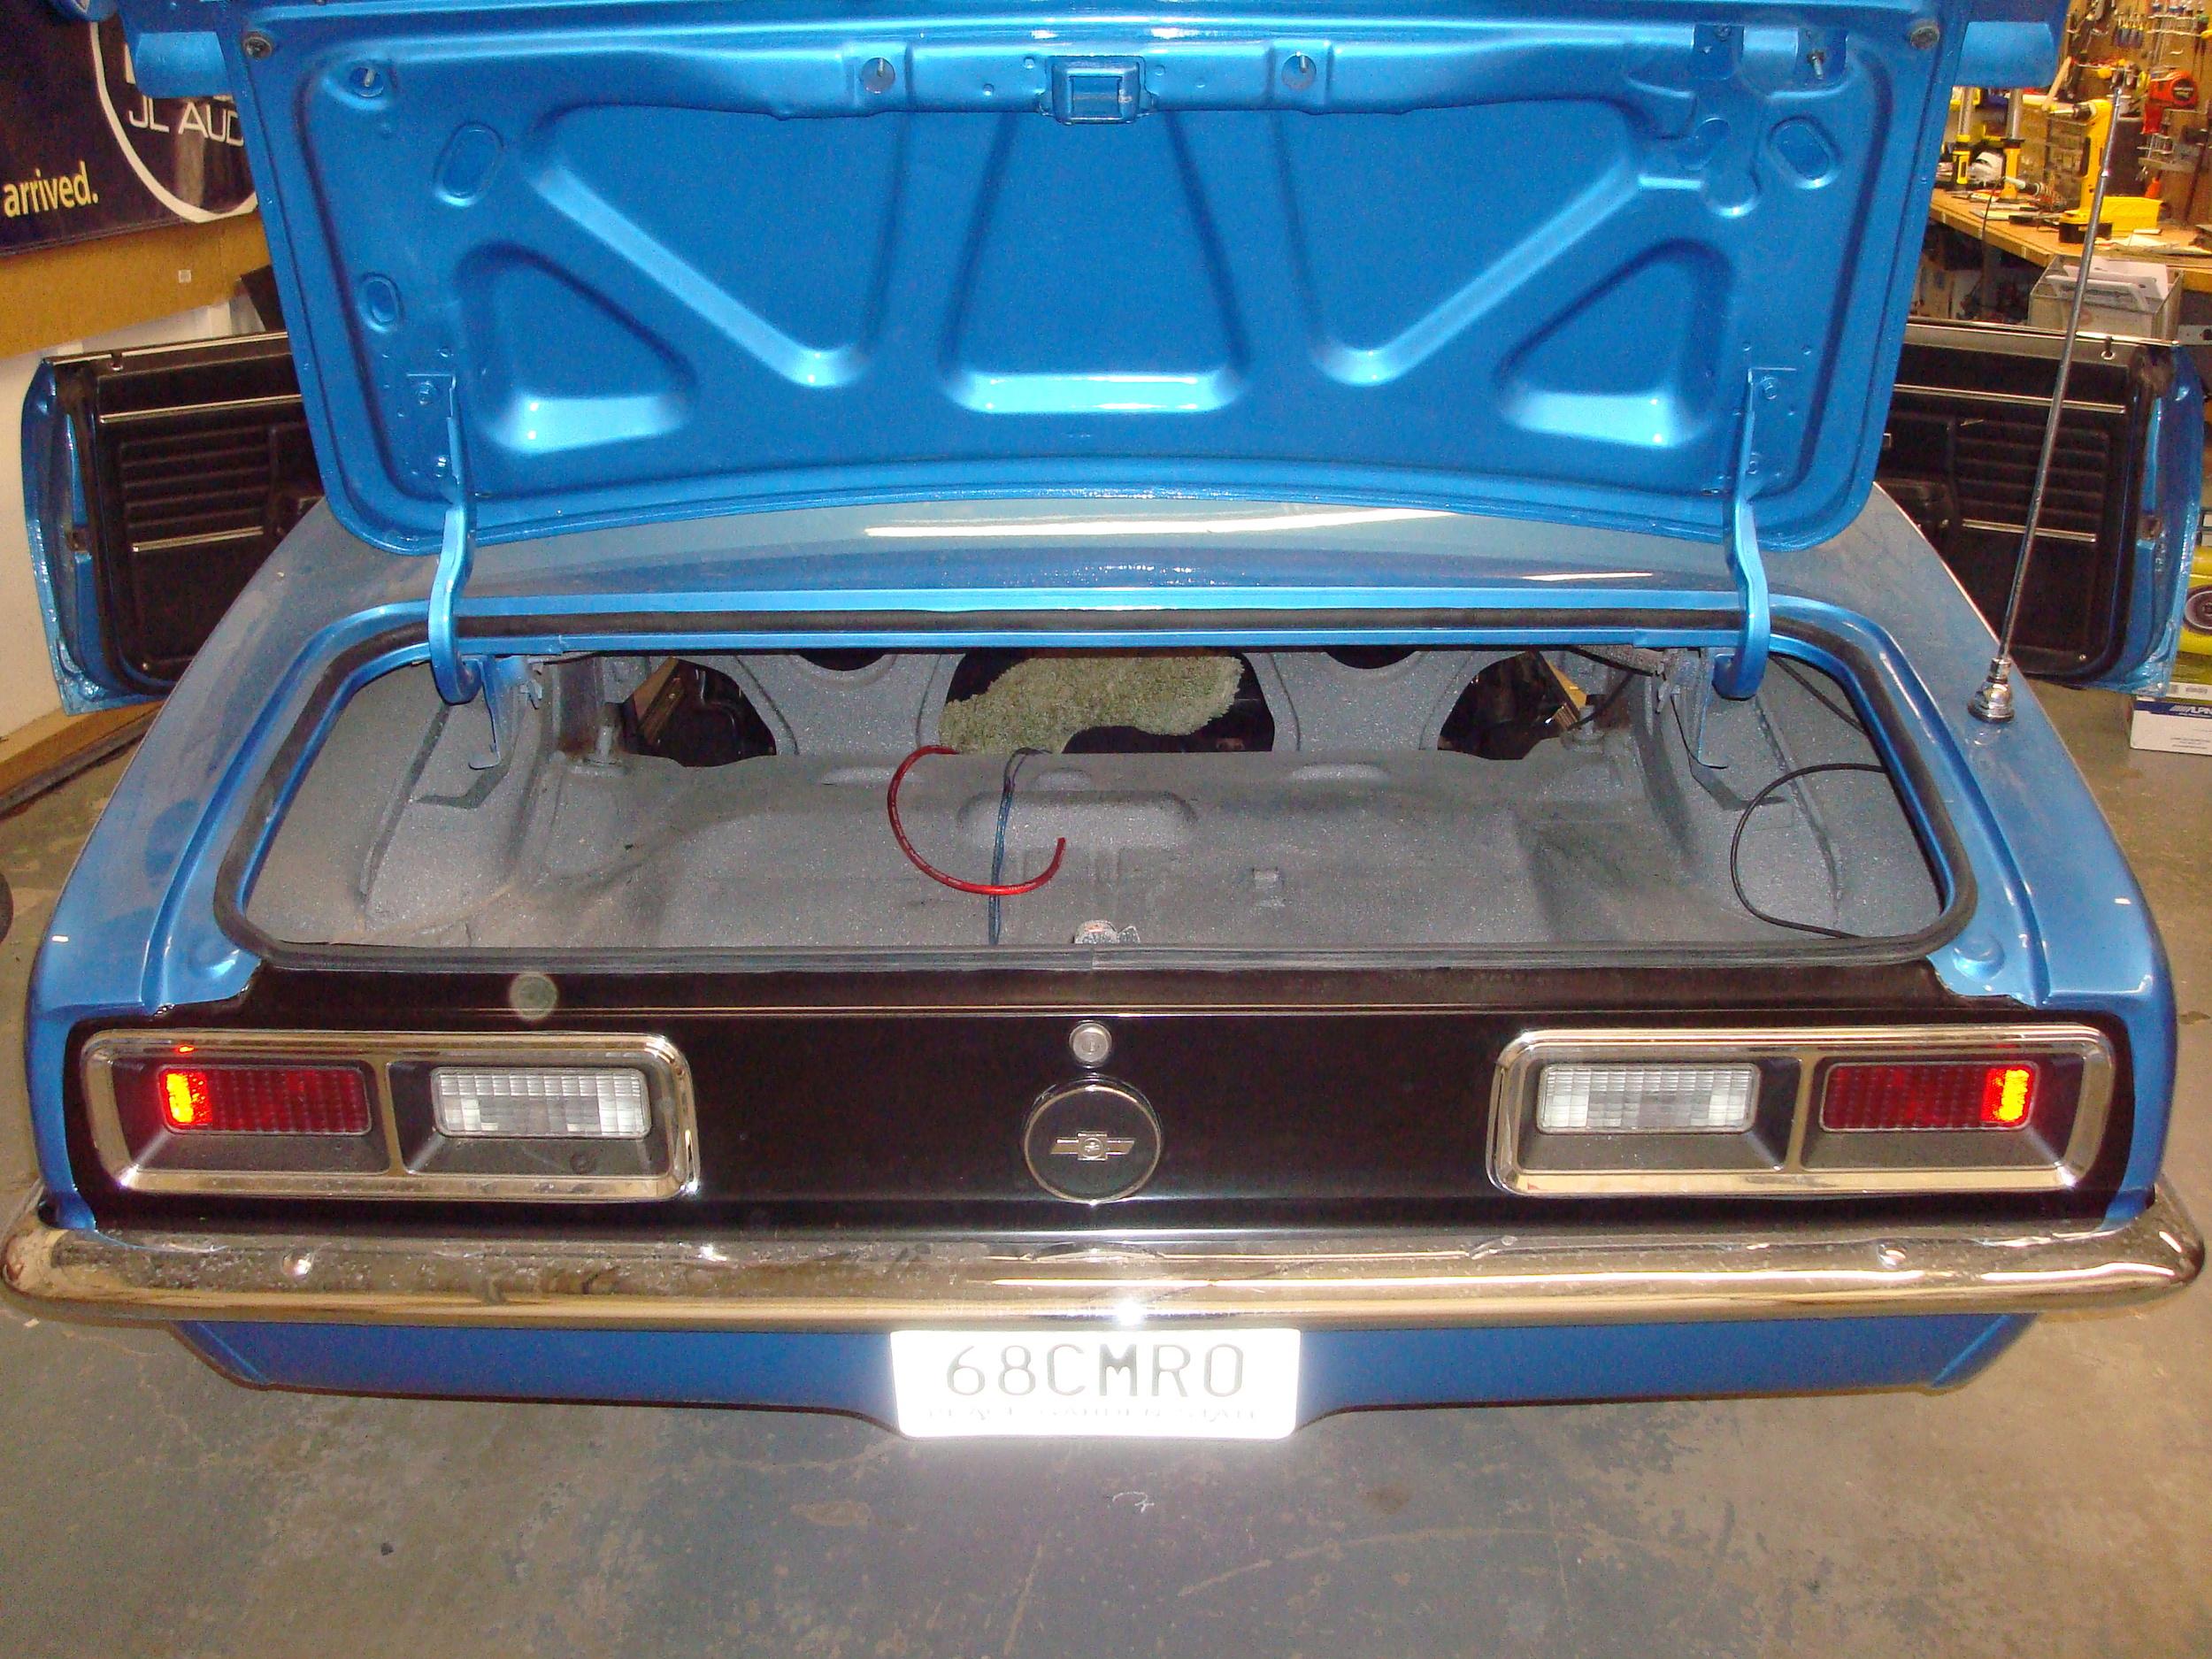 1968 Camaro - Trunk BEFORE